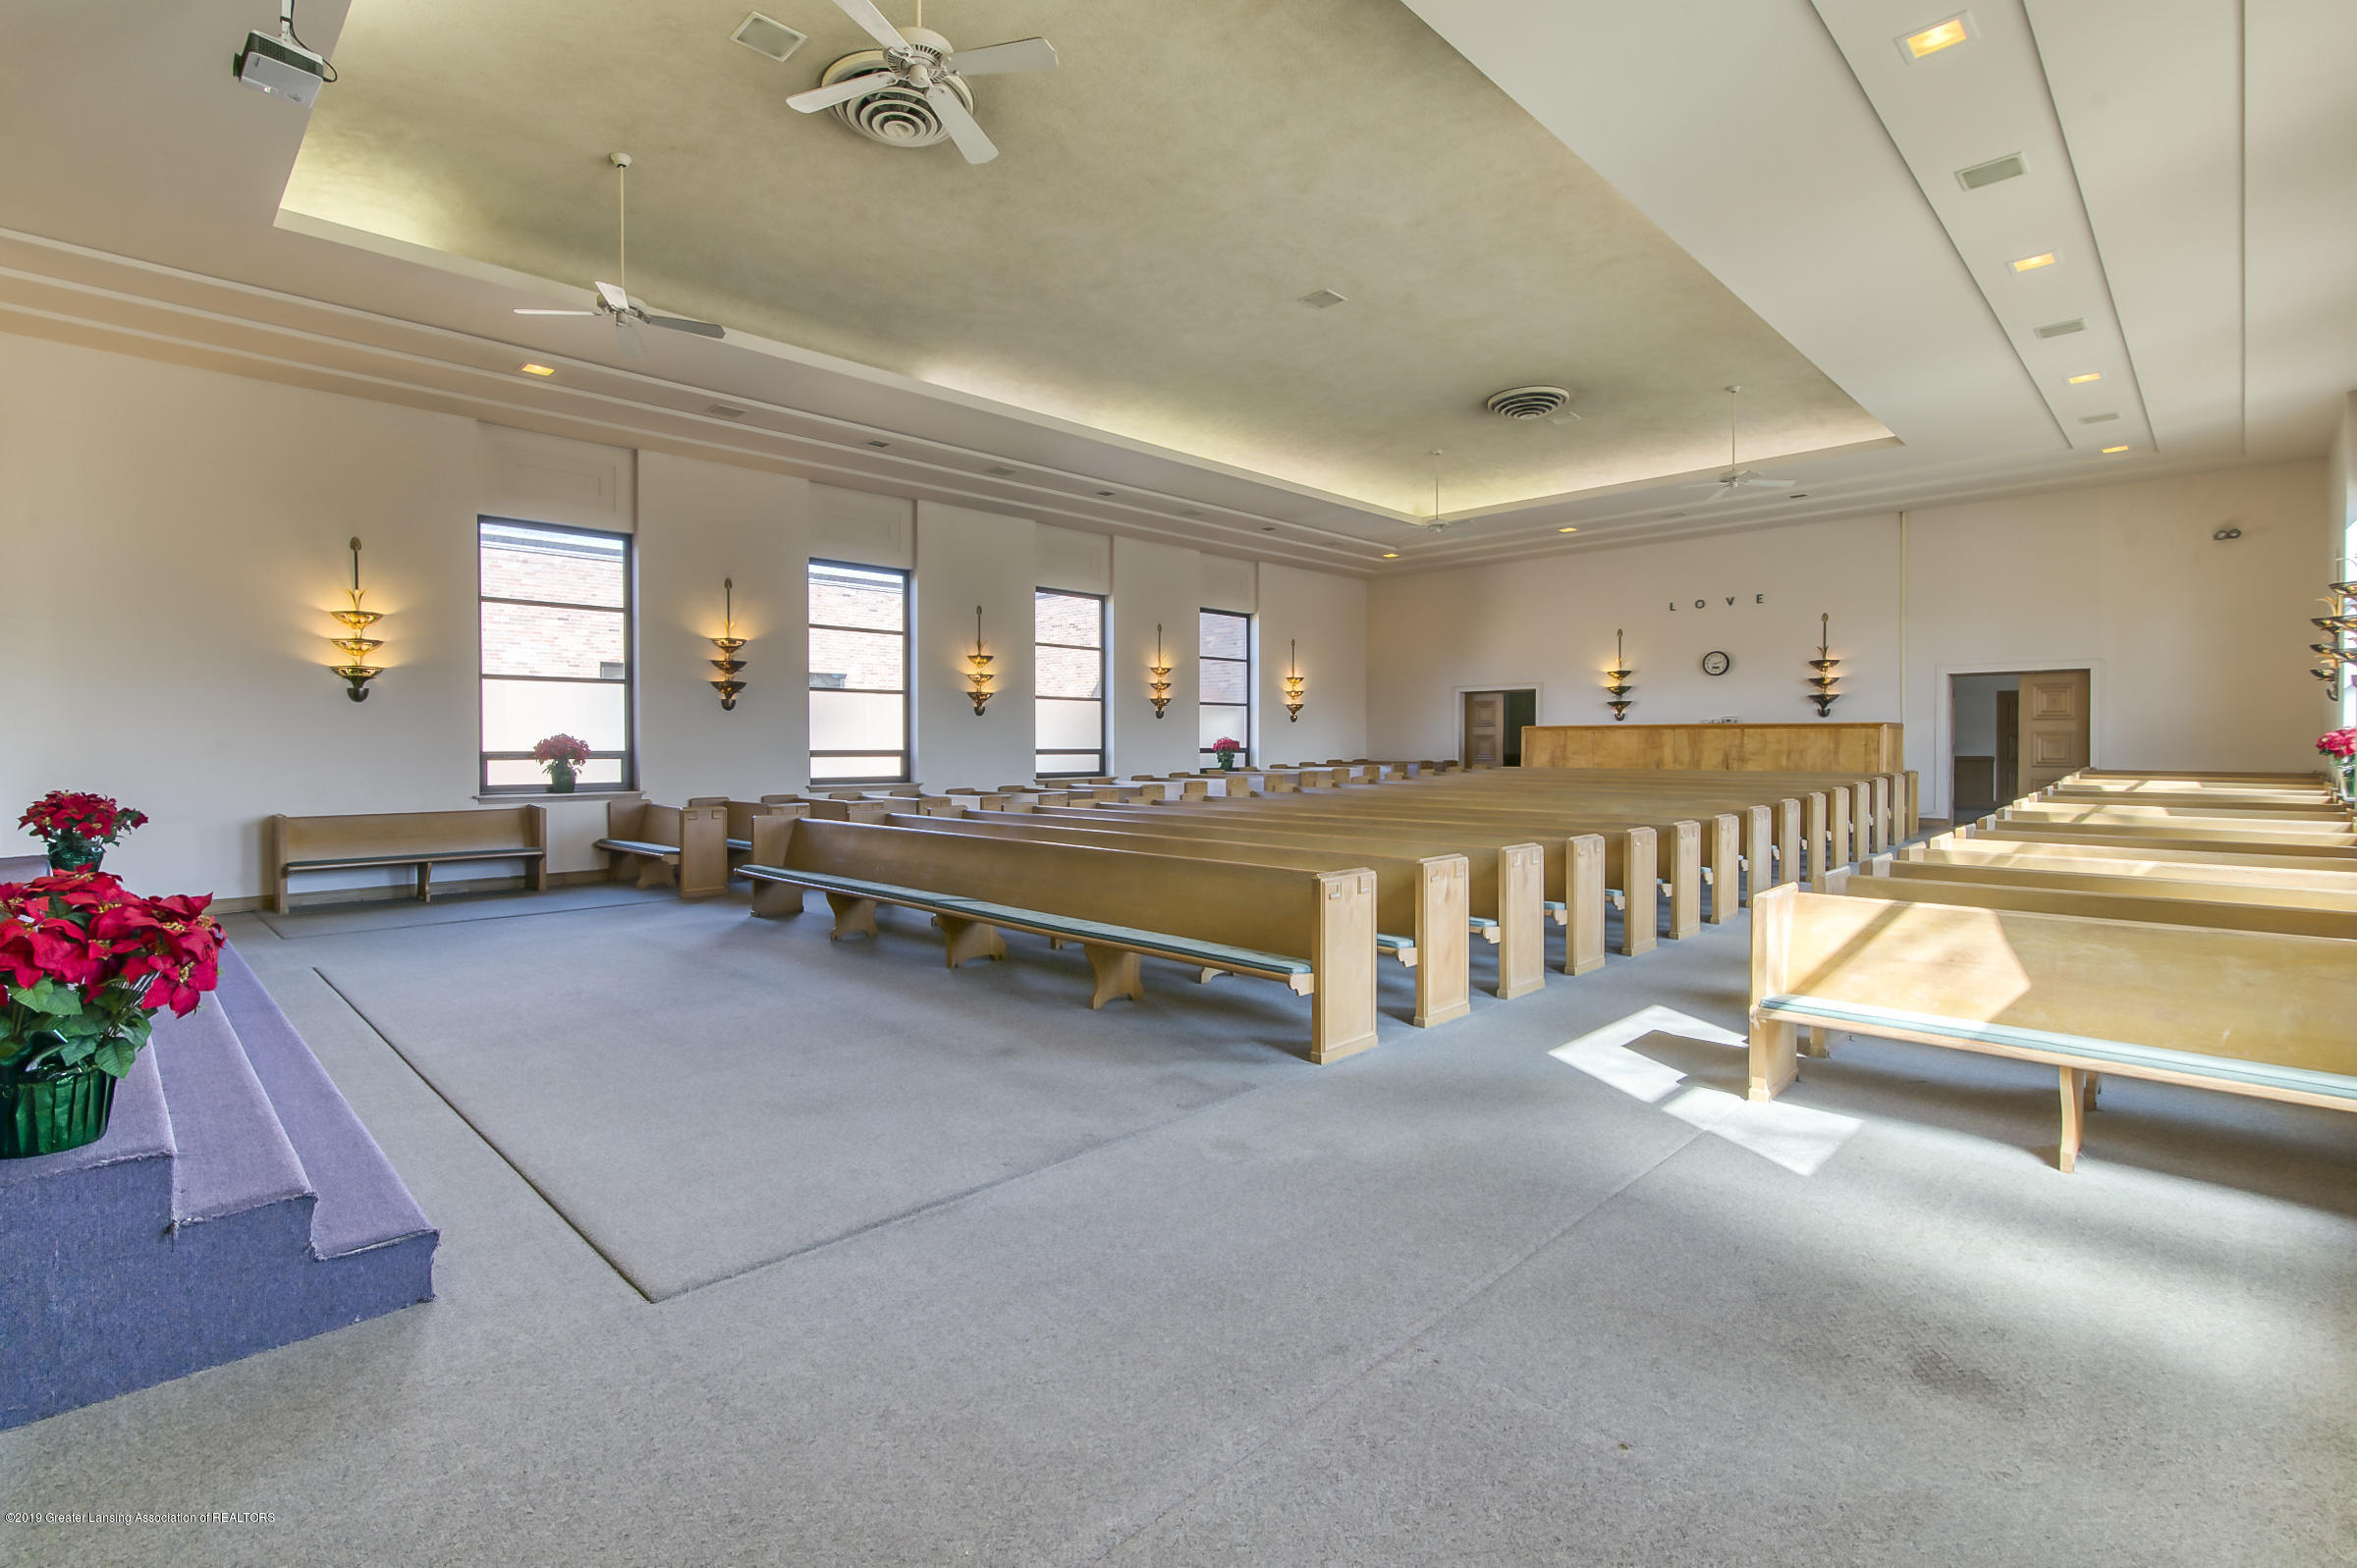 505 Seymour Ave - Sanctuary - 11